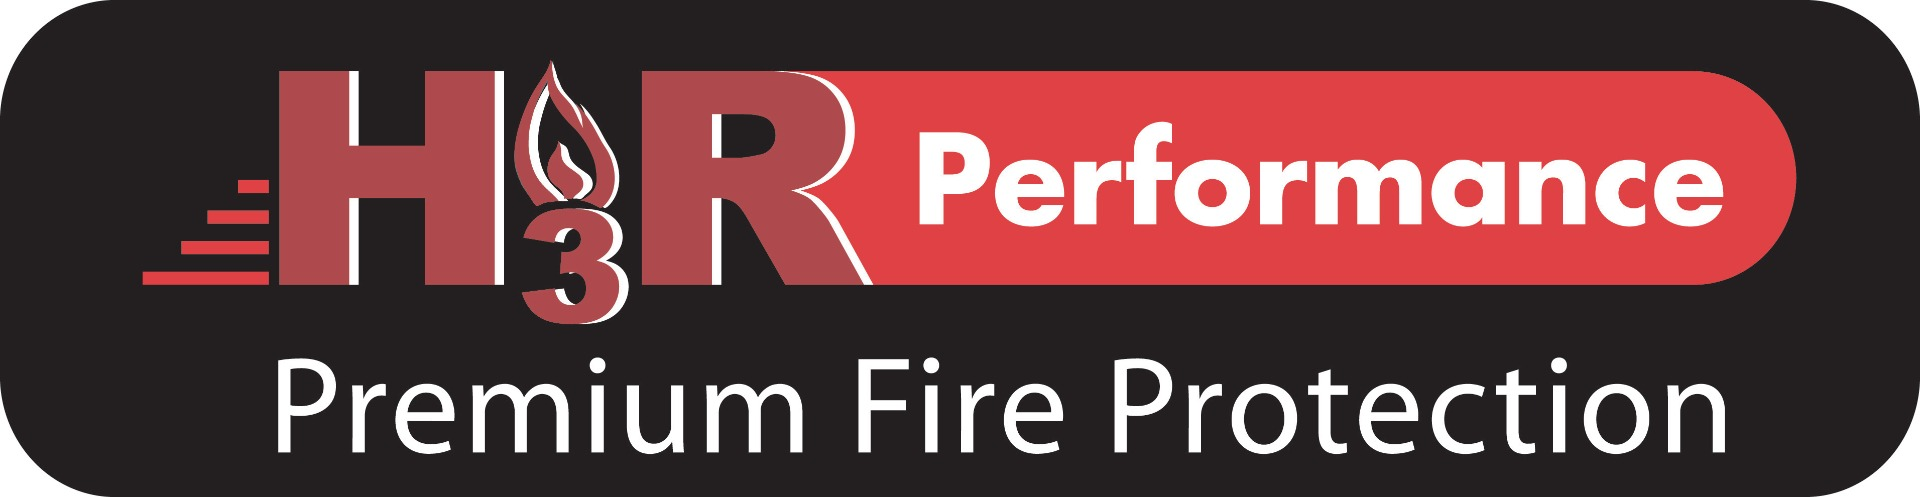 H3R Performance Logo